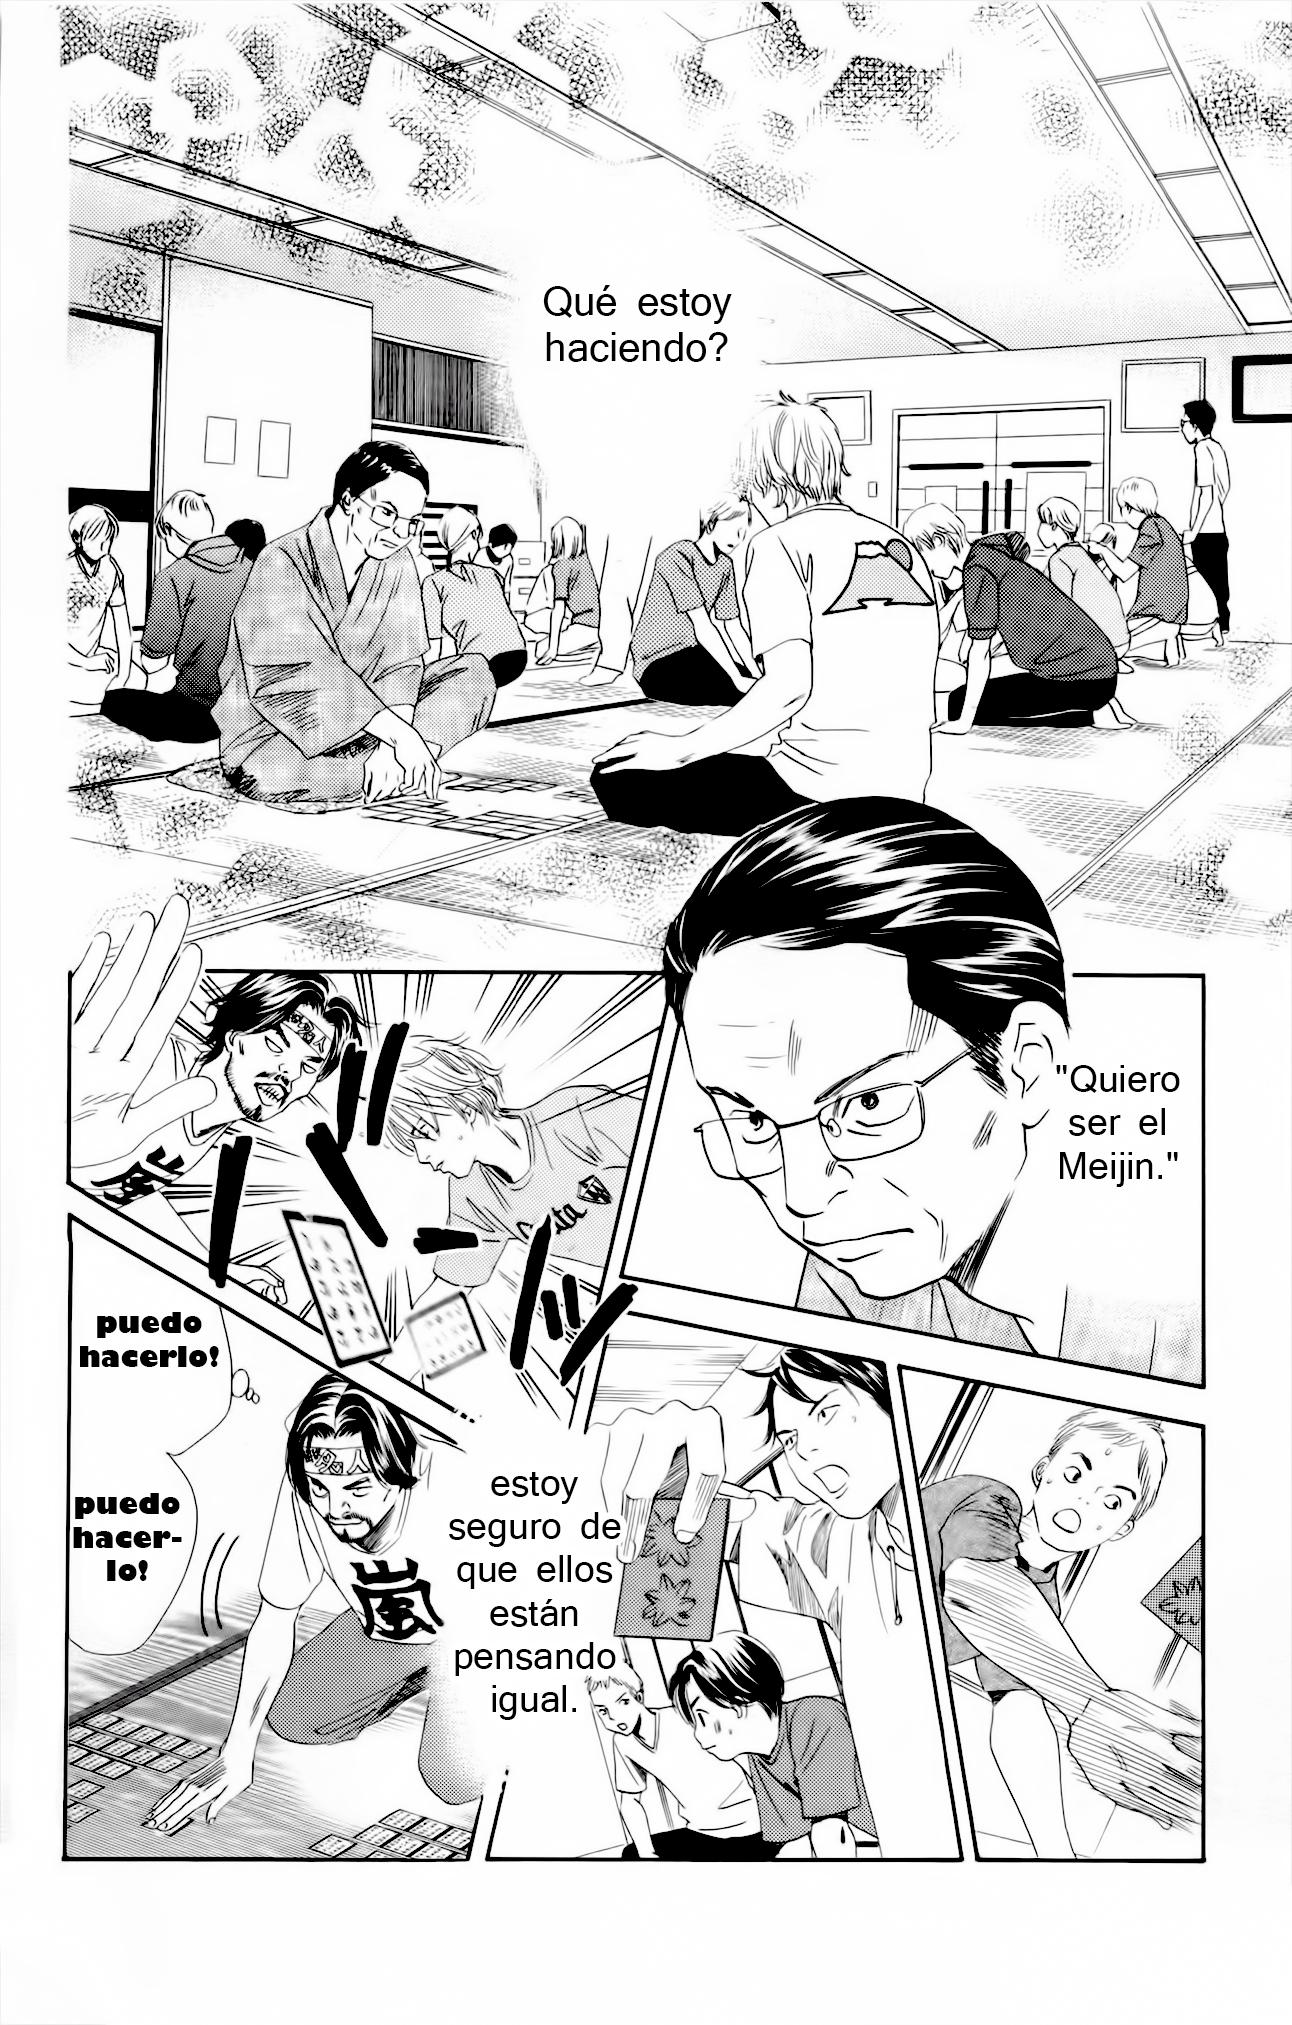 http://c5.ninemanga.com/es_manga/32/1824/380960/c76aee81096b61d20e04c6fcde1da3bb.jpg Page 3